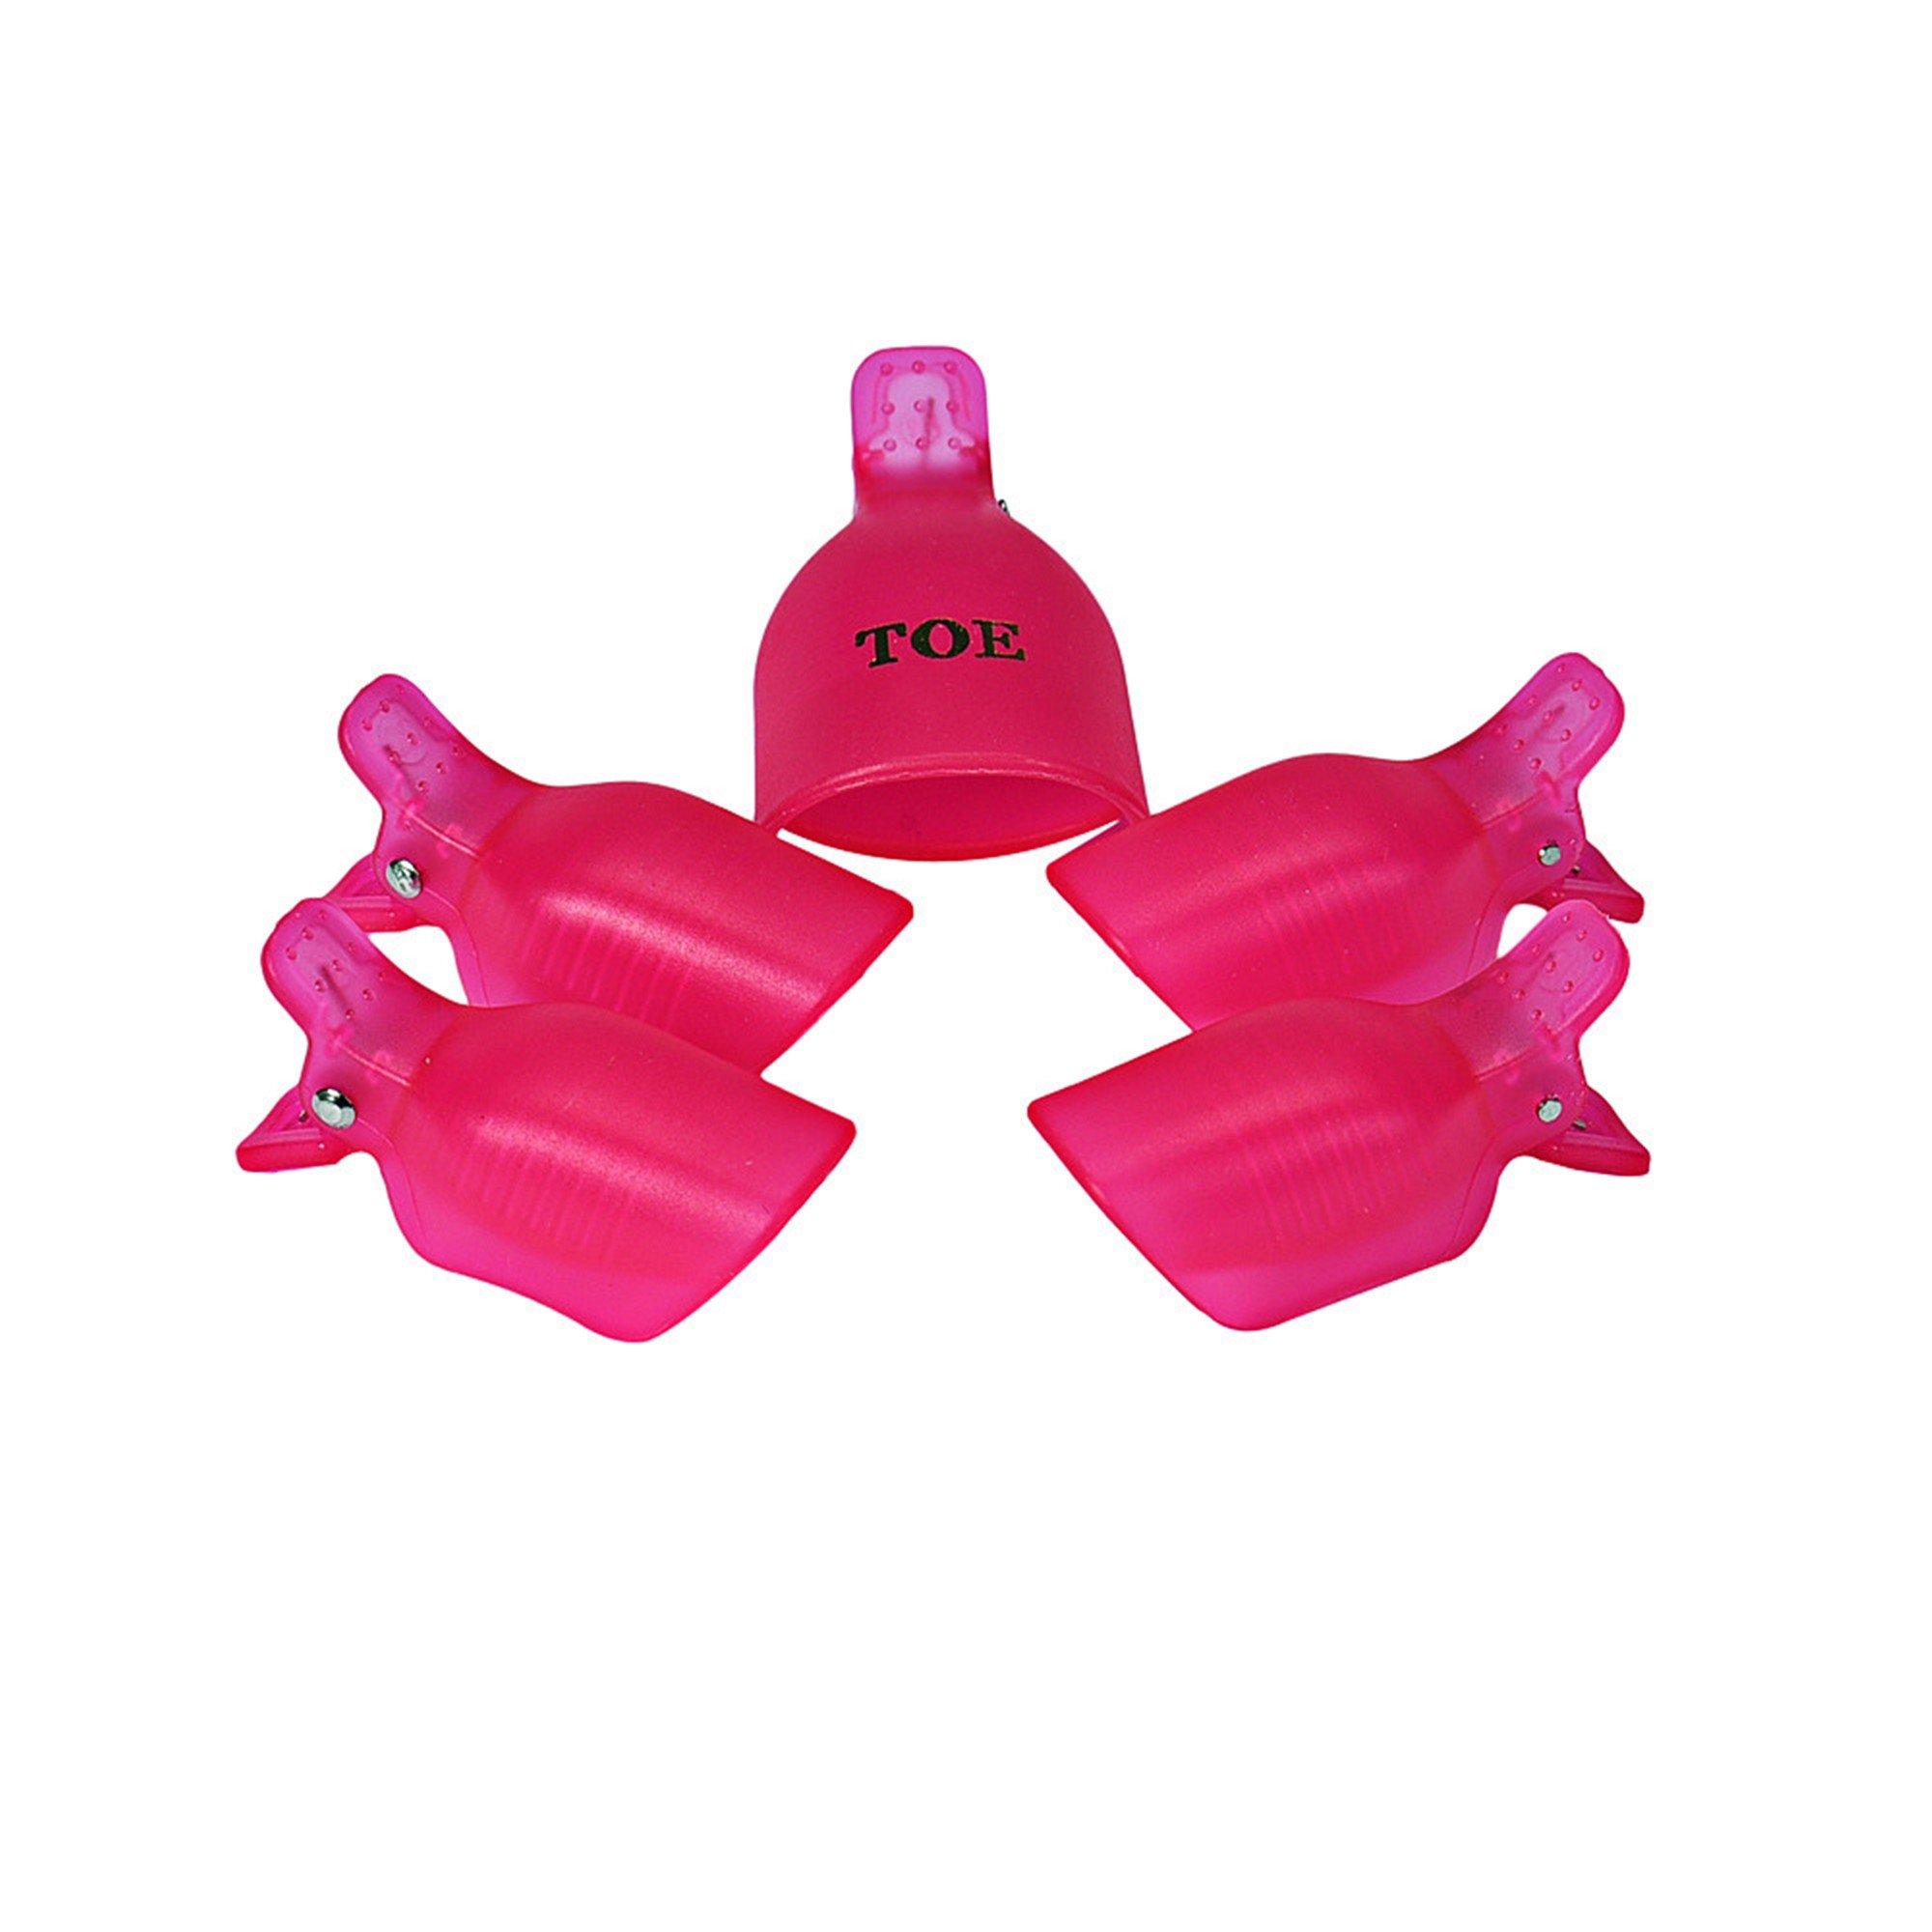 Sannysis 5PC Toenail Nail Art Soak Off Cap Clip UV Gel Polish Remover Wrap Tool Plastic (Hot pink)